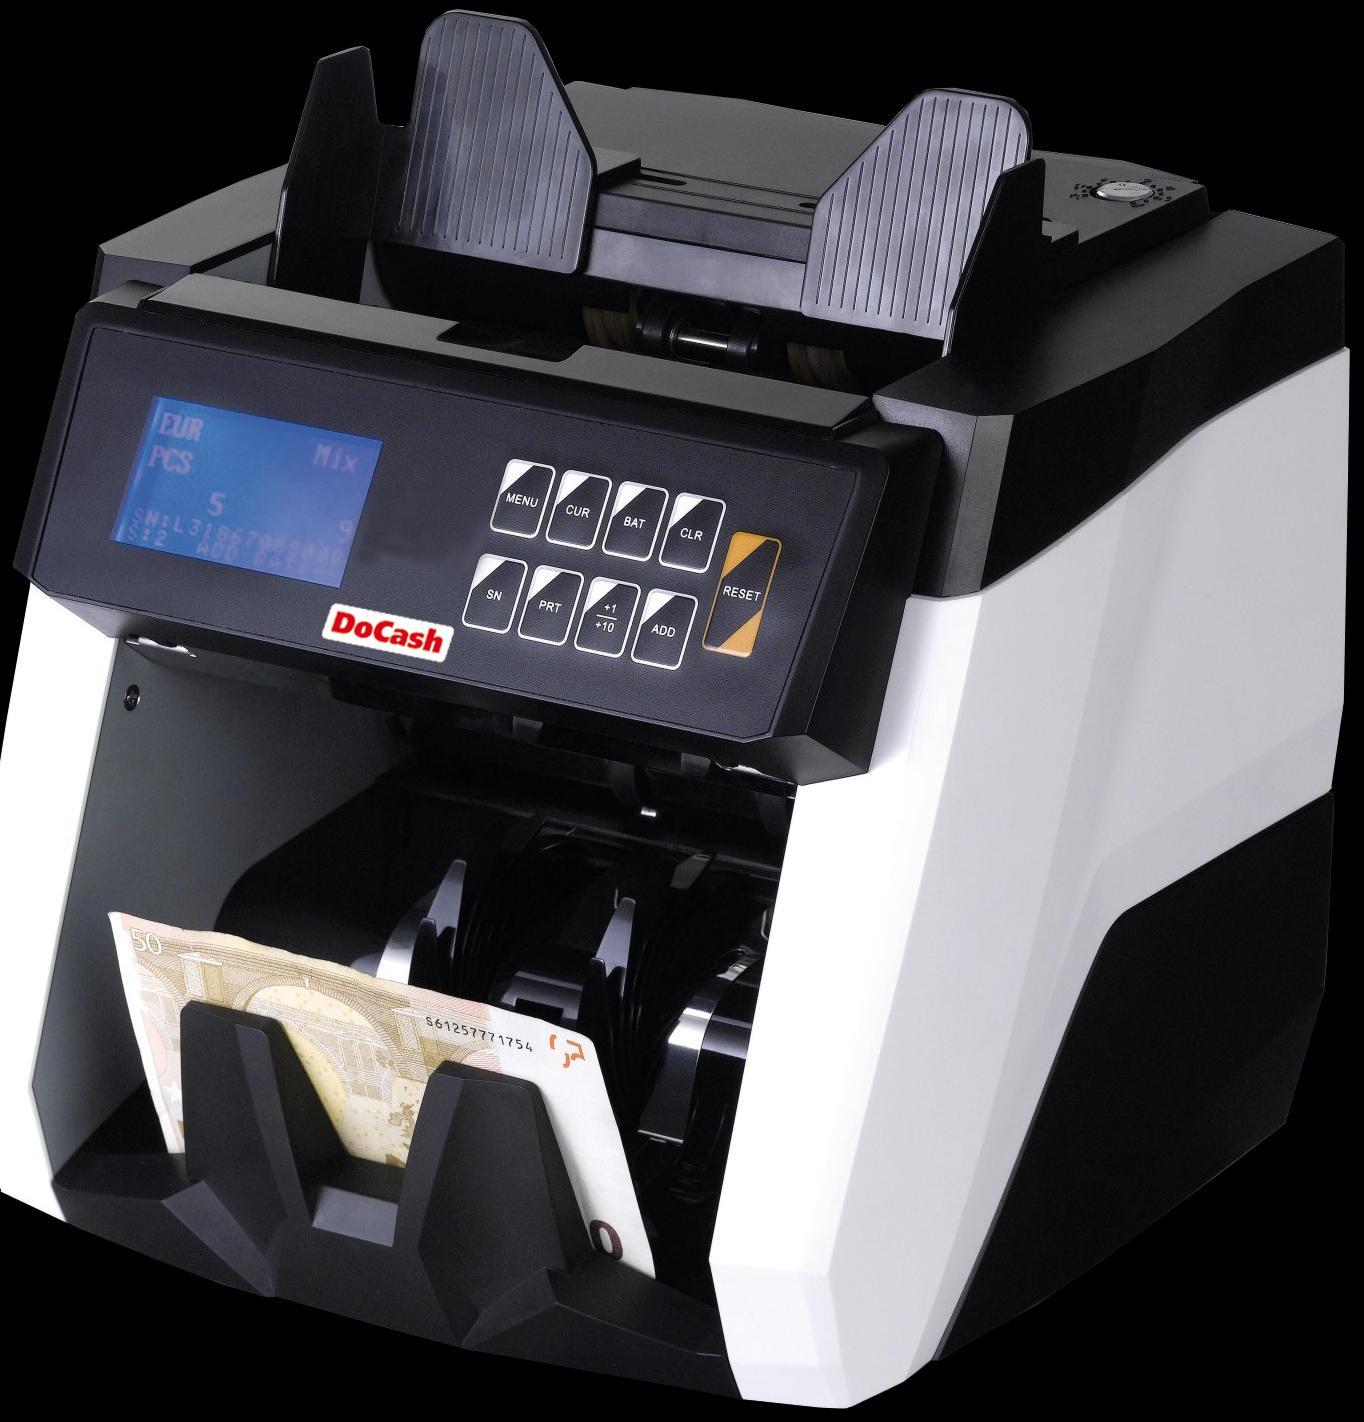 DoCash 3300 Value (9659) - счетчик банкнот с детекцией (Black/White)